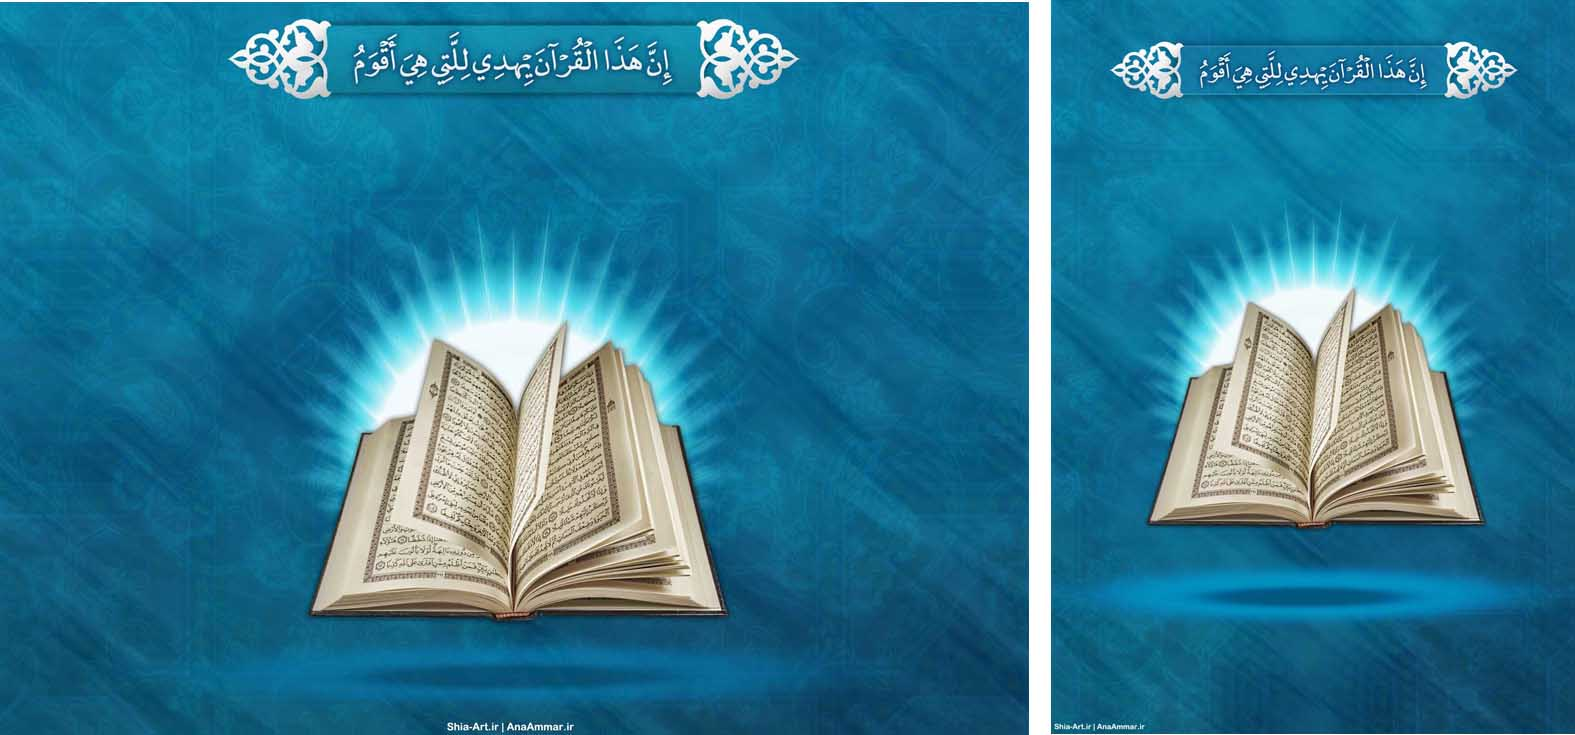 بنر و پوستر محافل قرآنی - قسمت اول